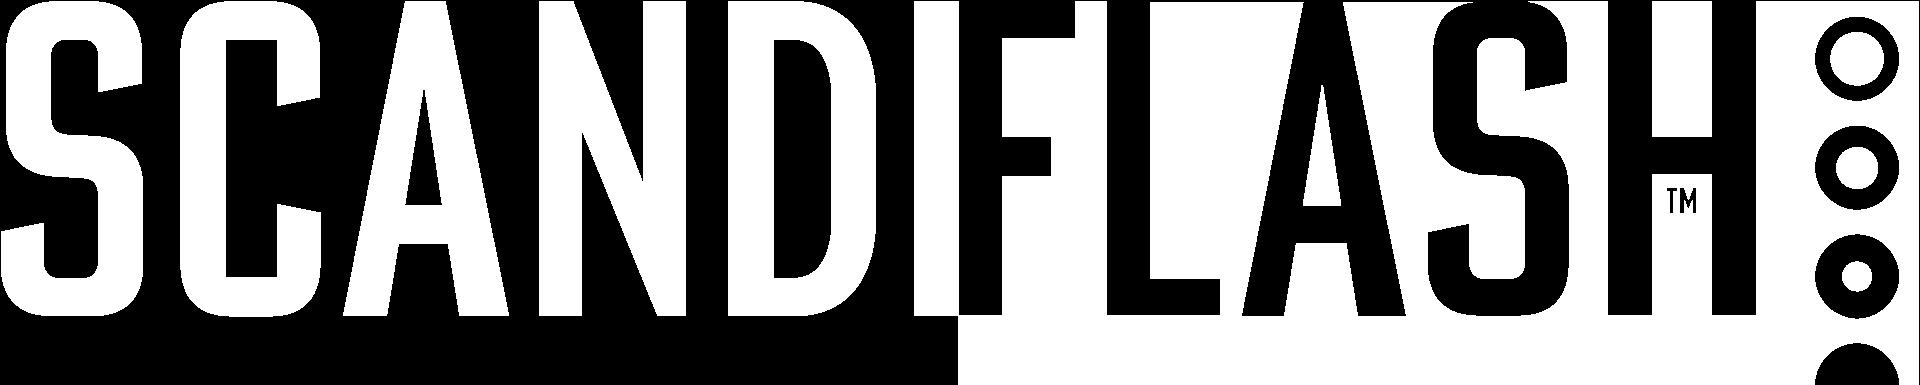 Scandiflash logo 2021.